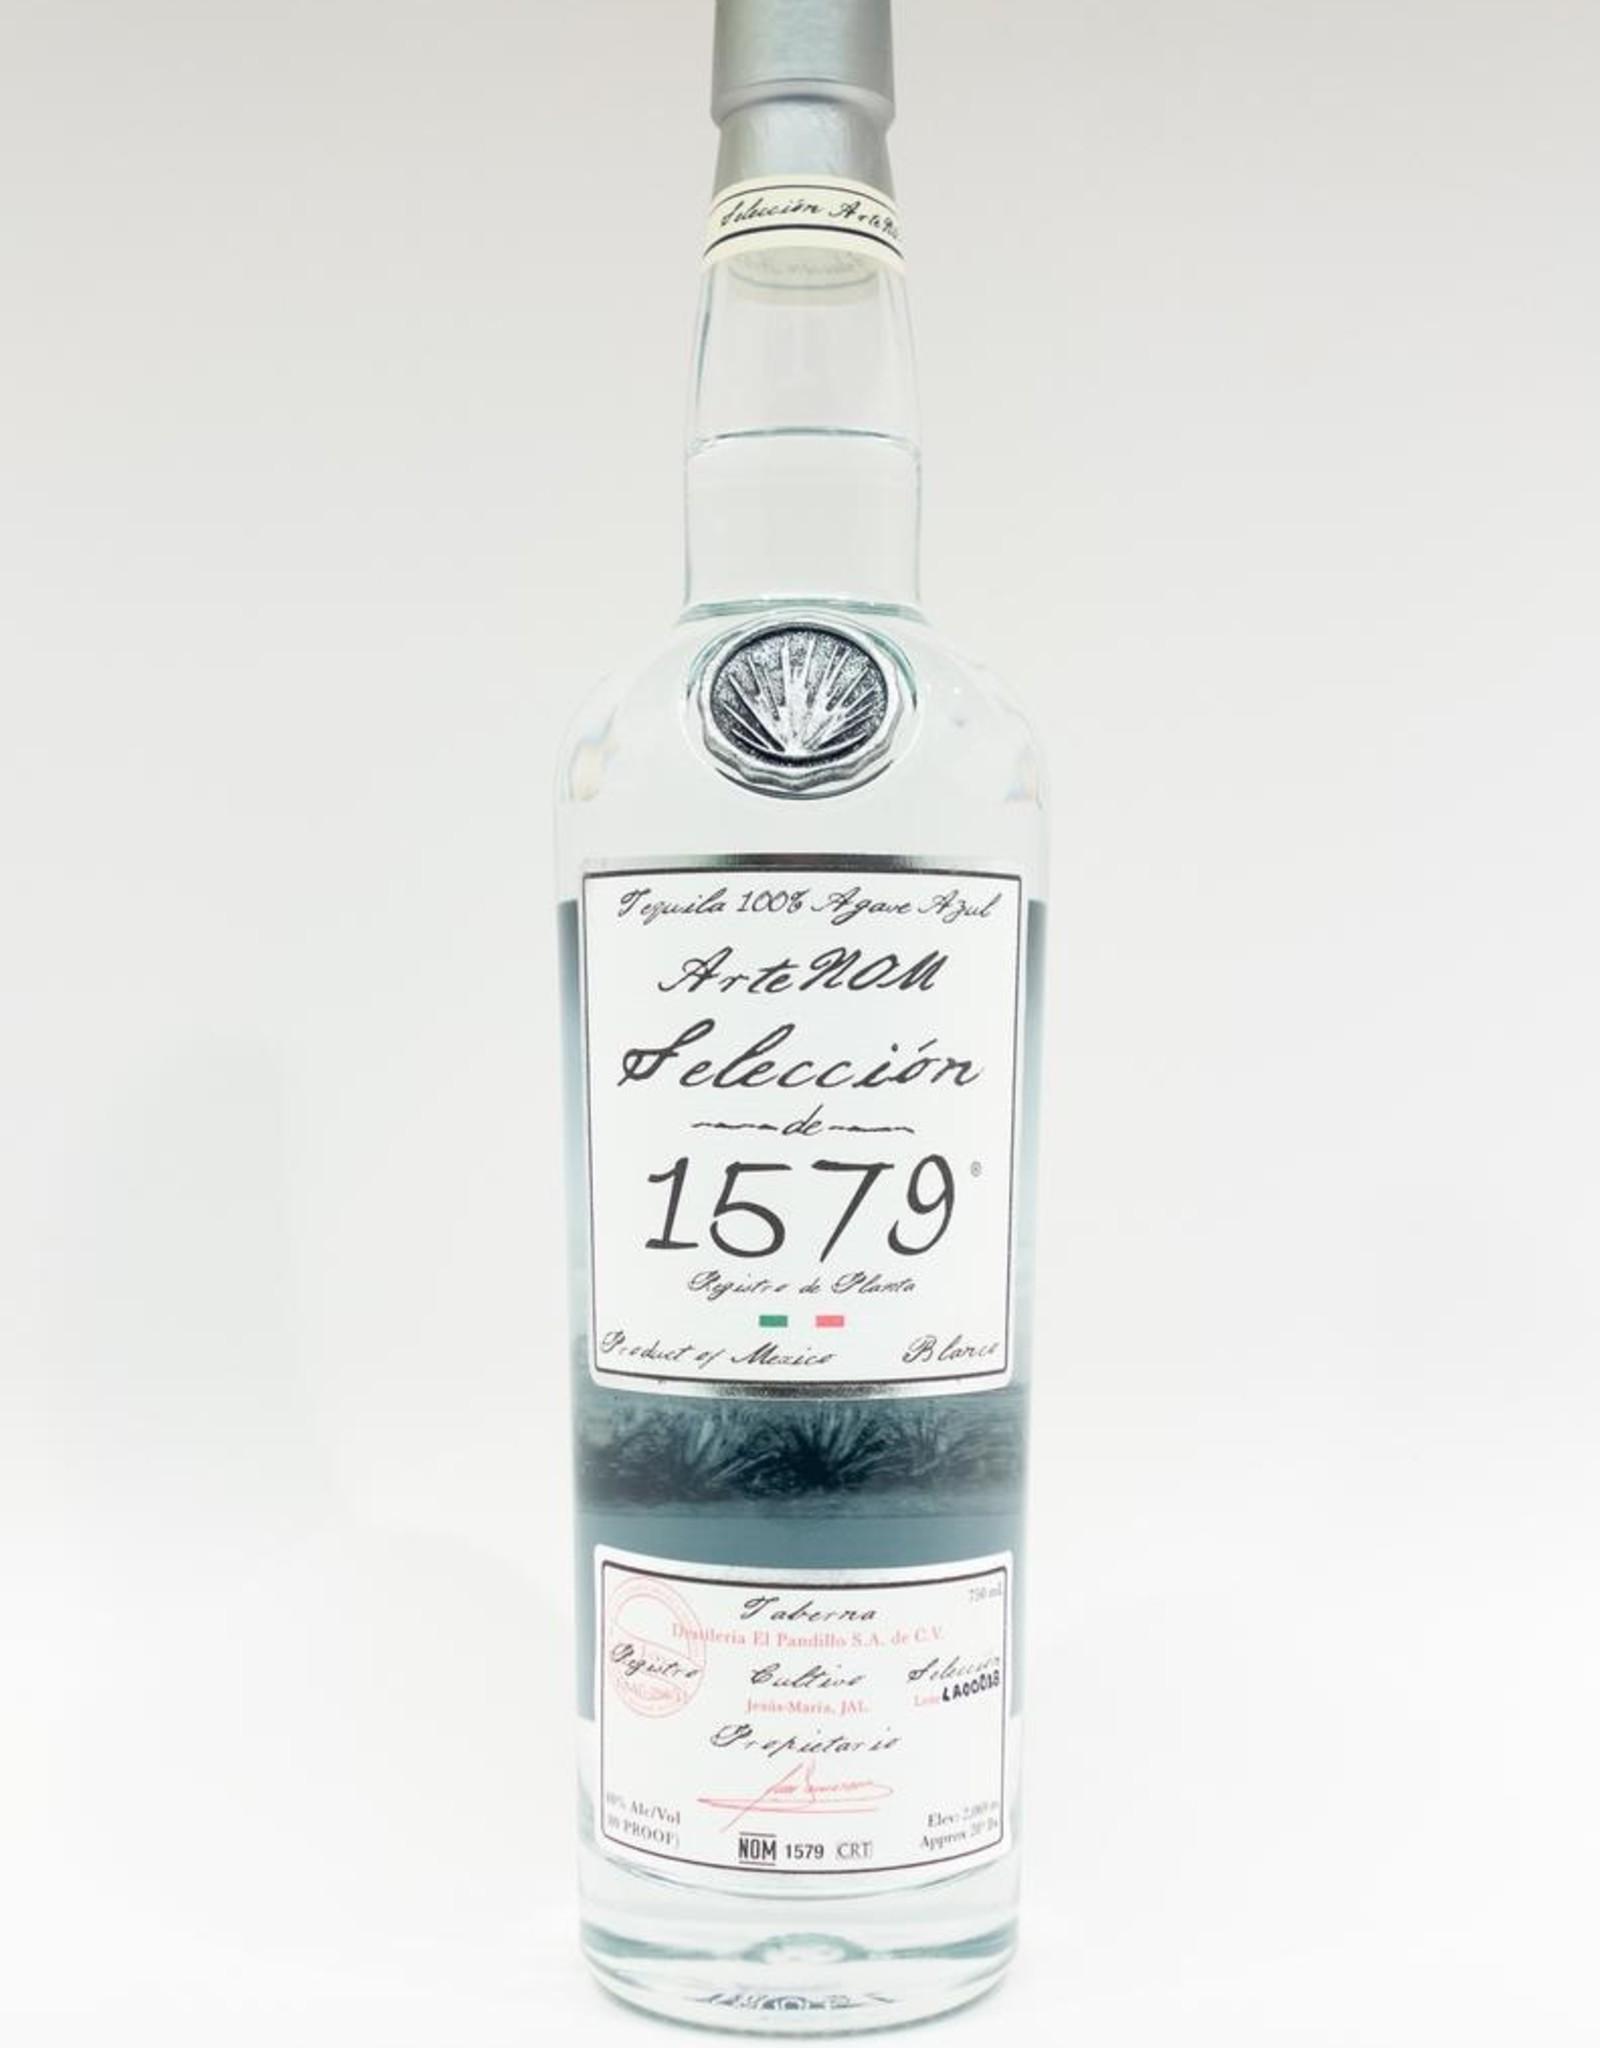 Spirits-Tequila-Silver ArteNOM 1579 Tequila Blanco 750ml